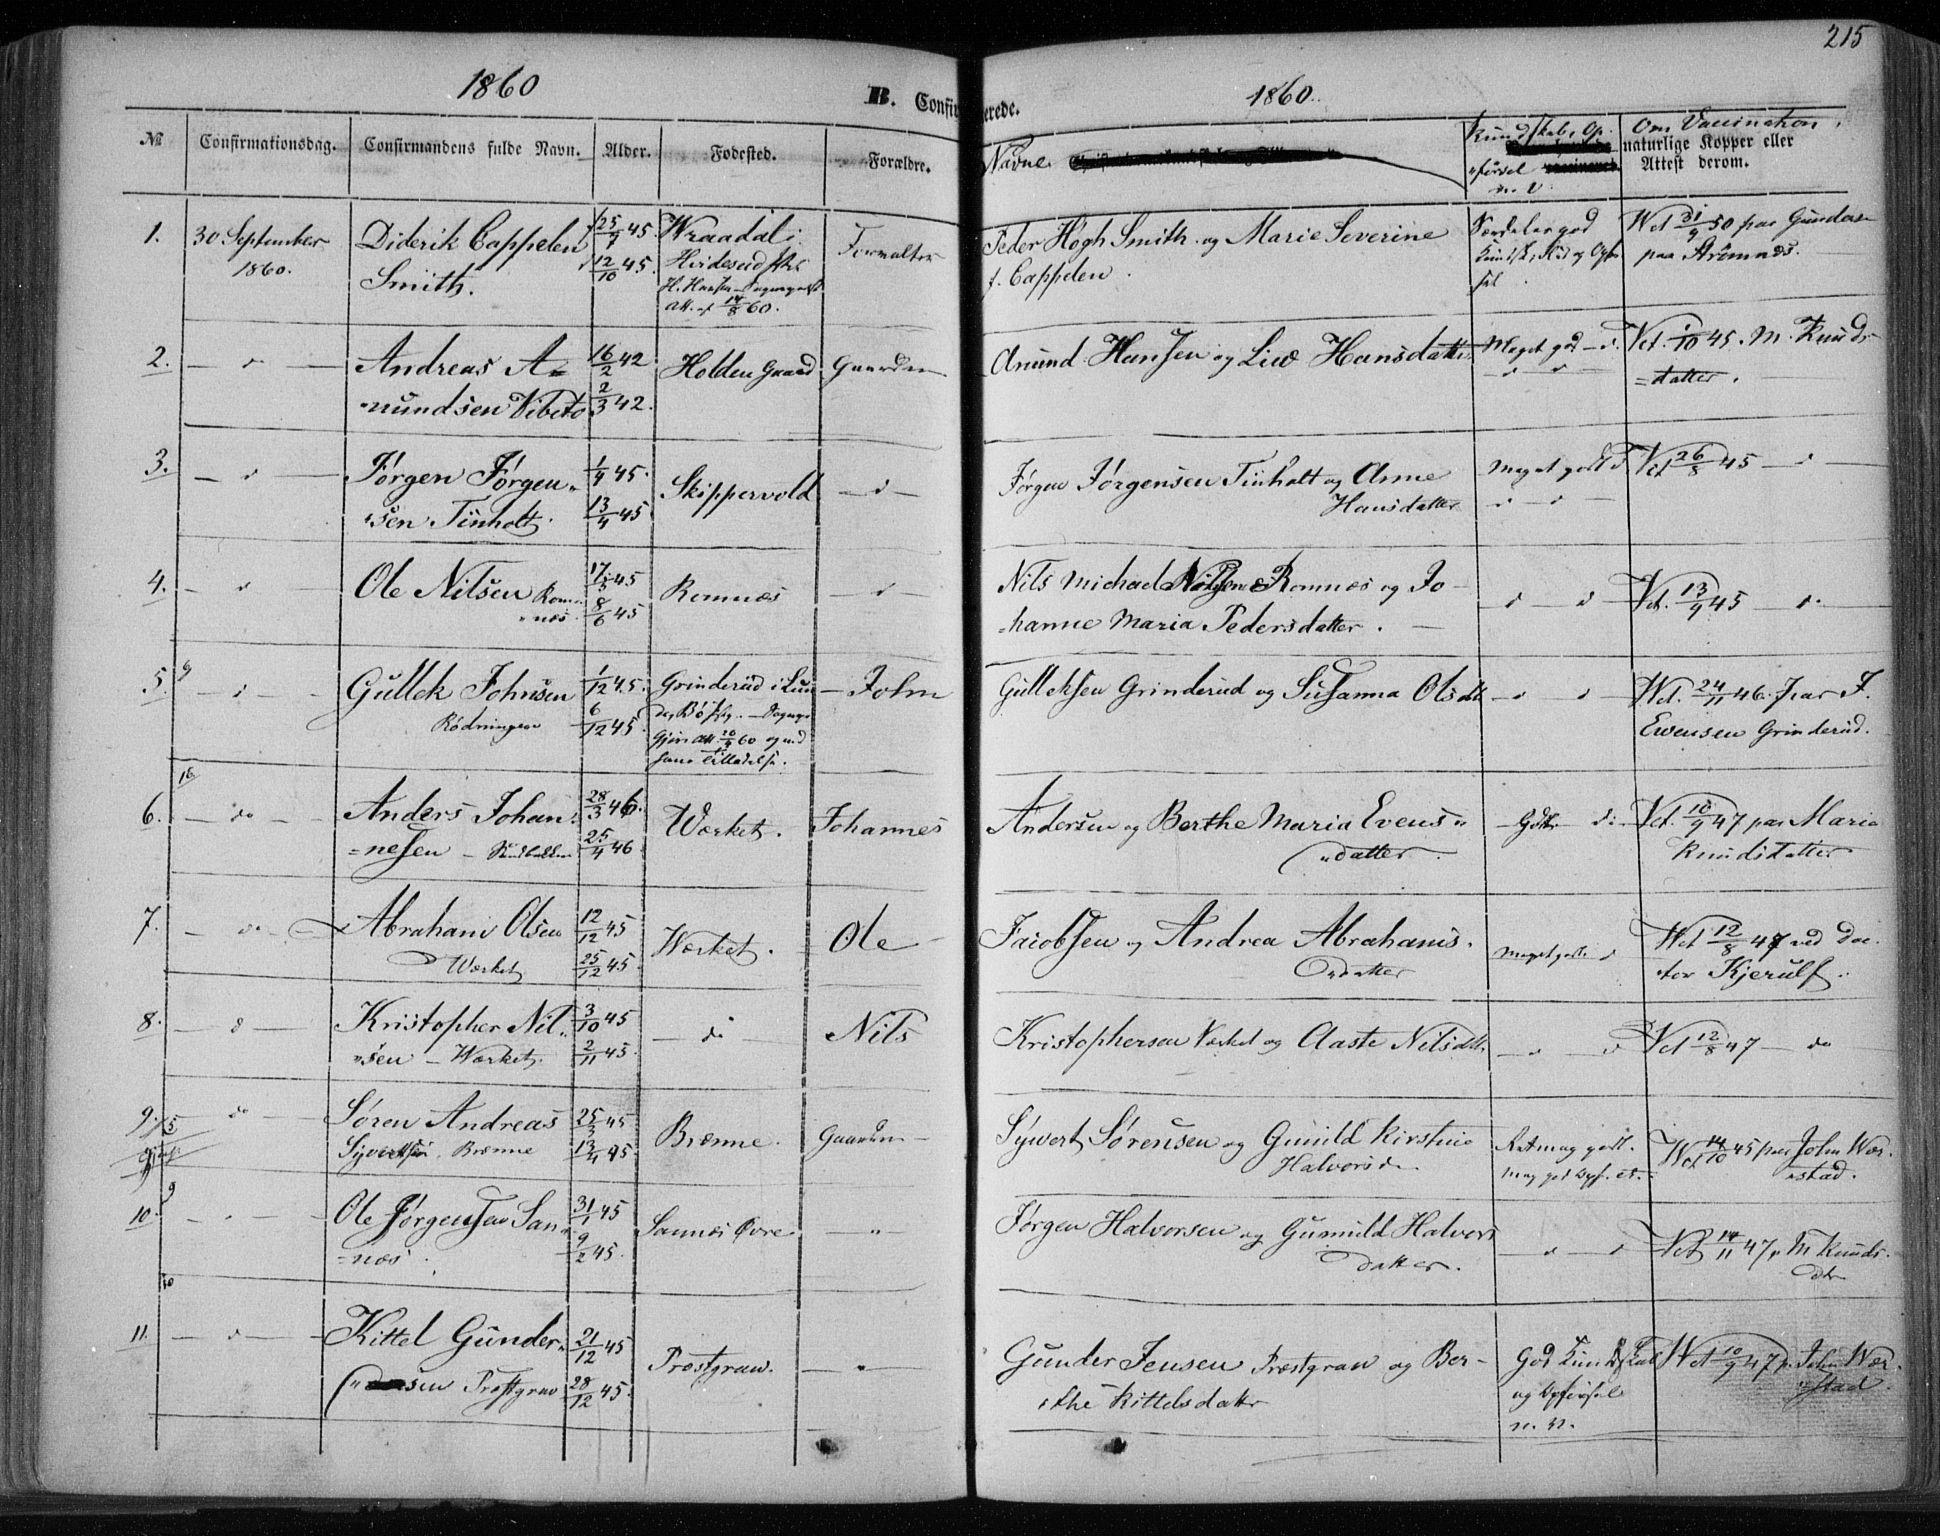 SAKO, Holla kirkebøker, F/Fa/L0005: Ministerialbok nr. 5, 1849-1860, s. 215